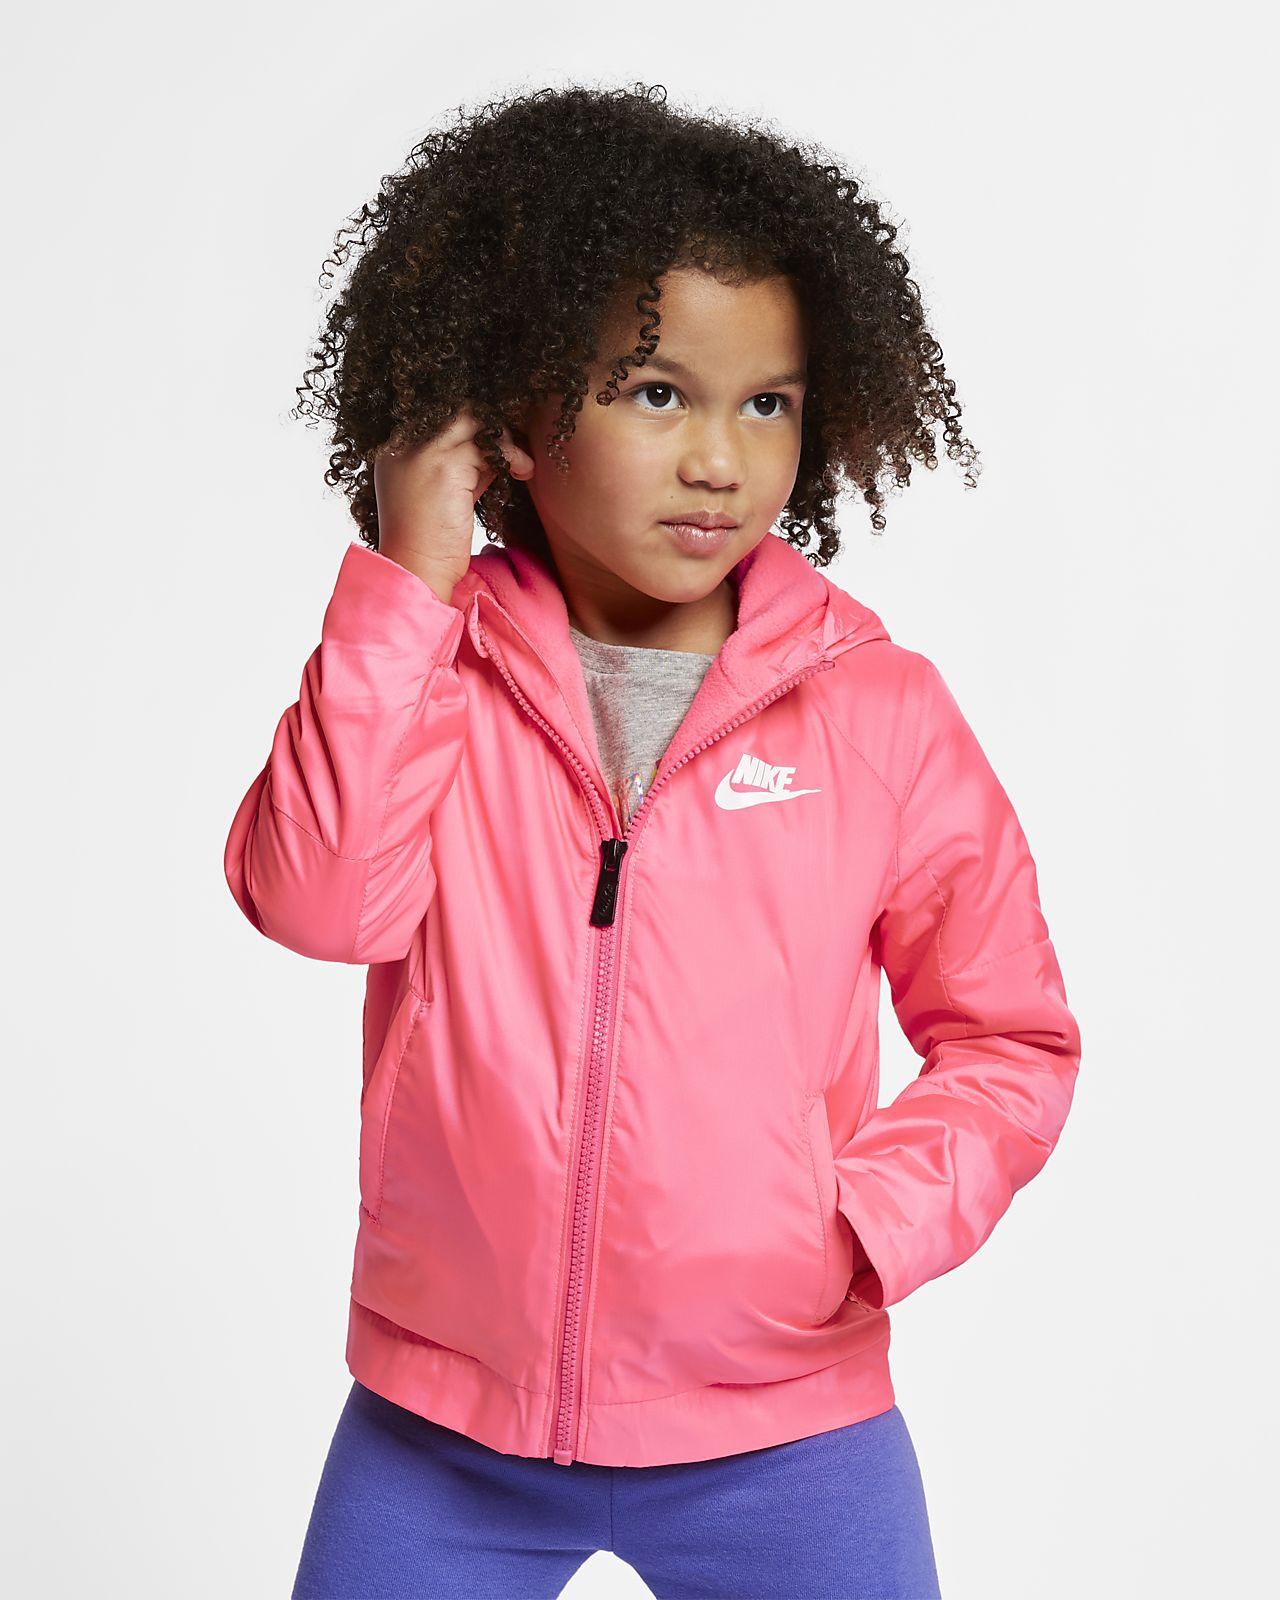 Jacka Nike Sportswear för små barn